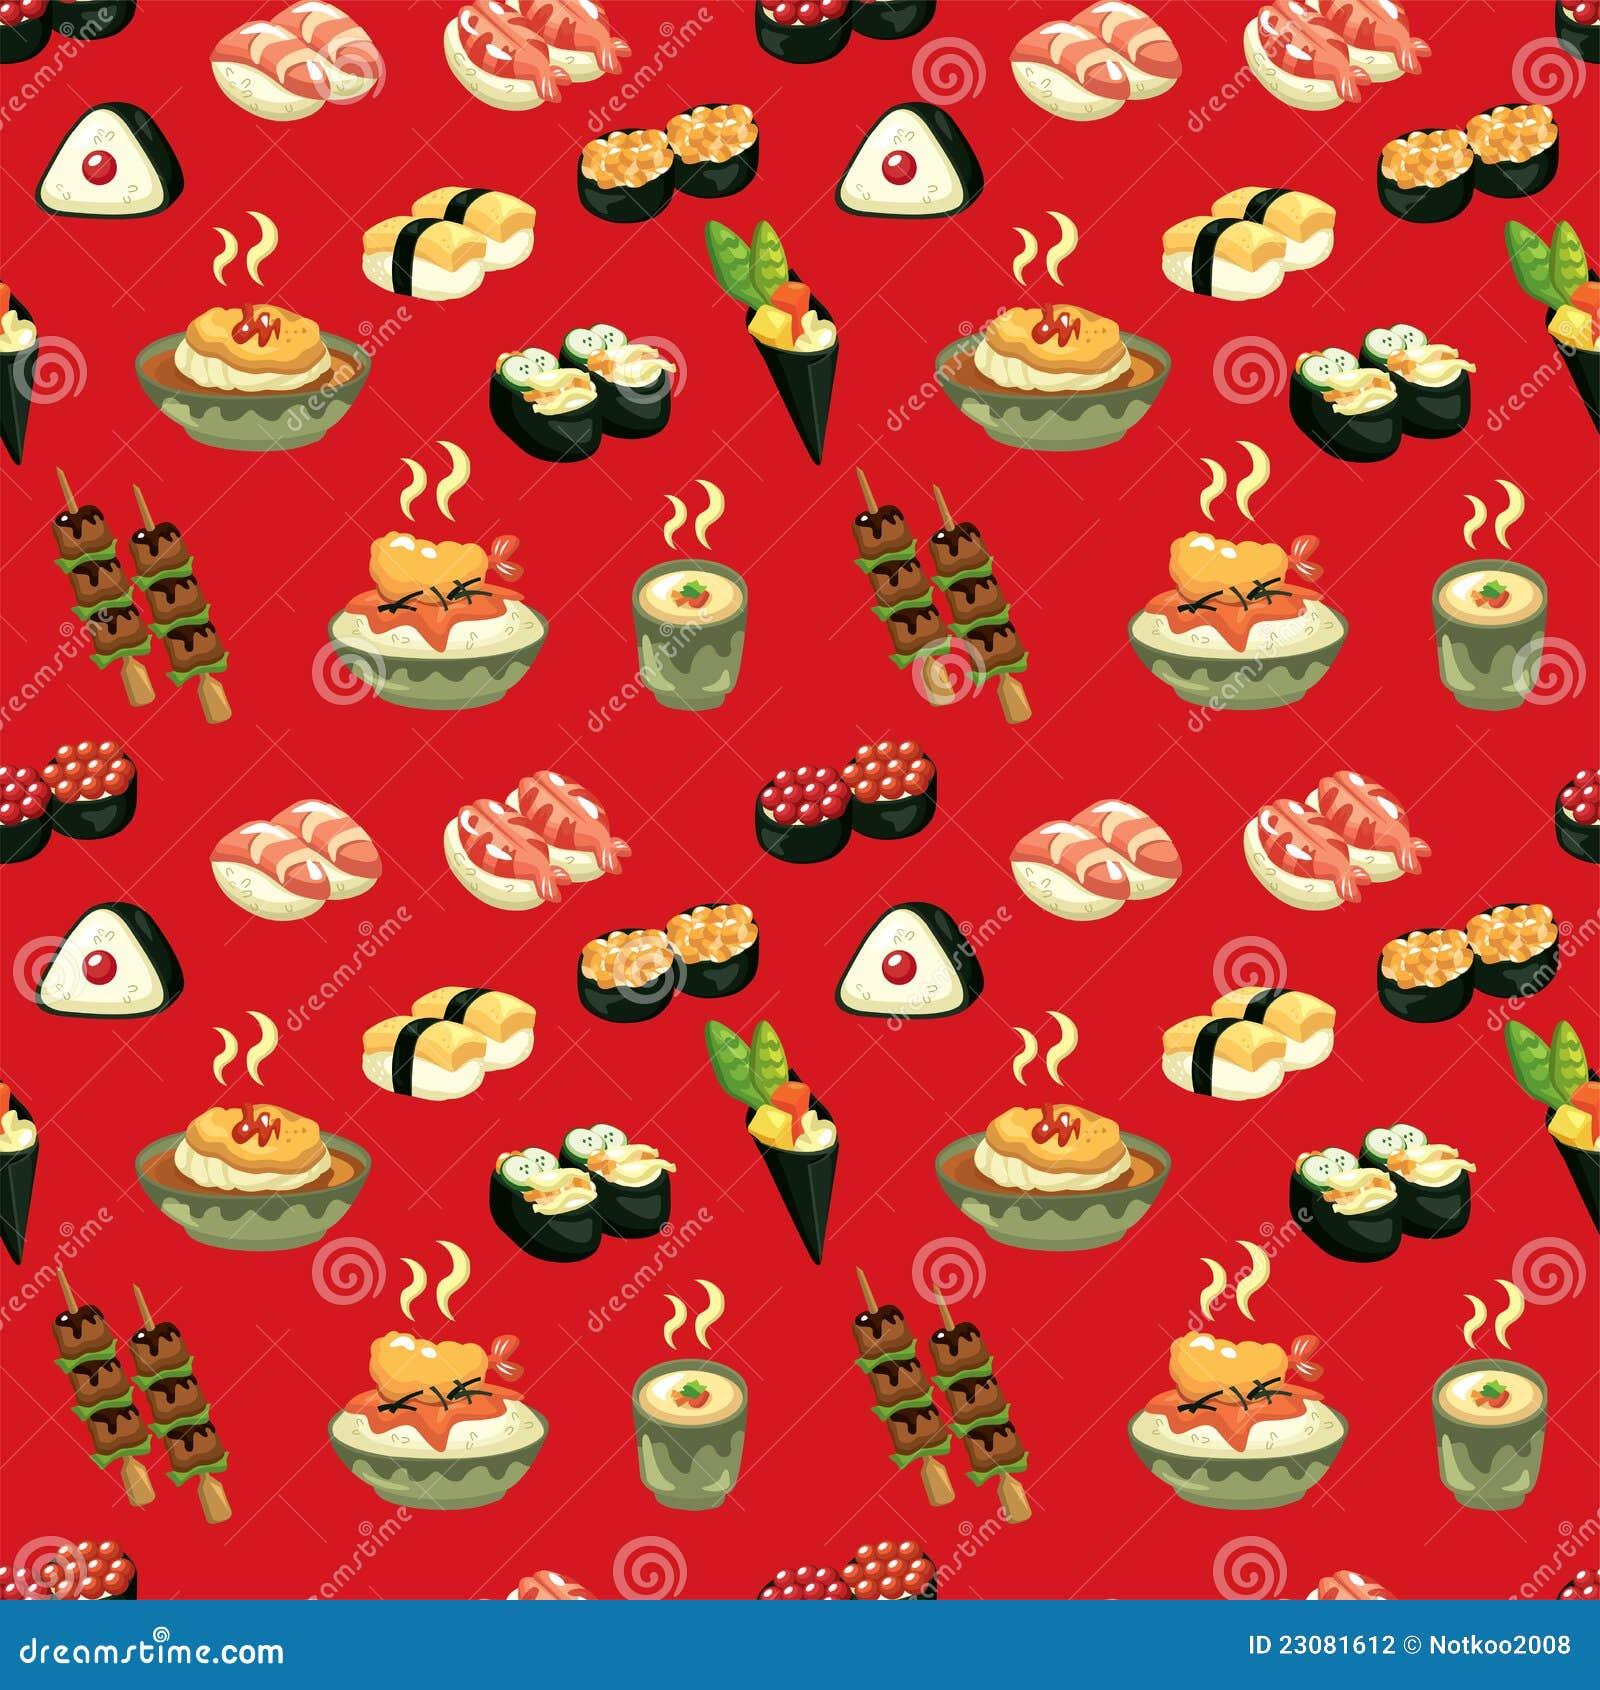 Seamless Japanese Food Pattern Stock Vector - Image: 23081612